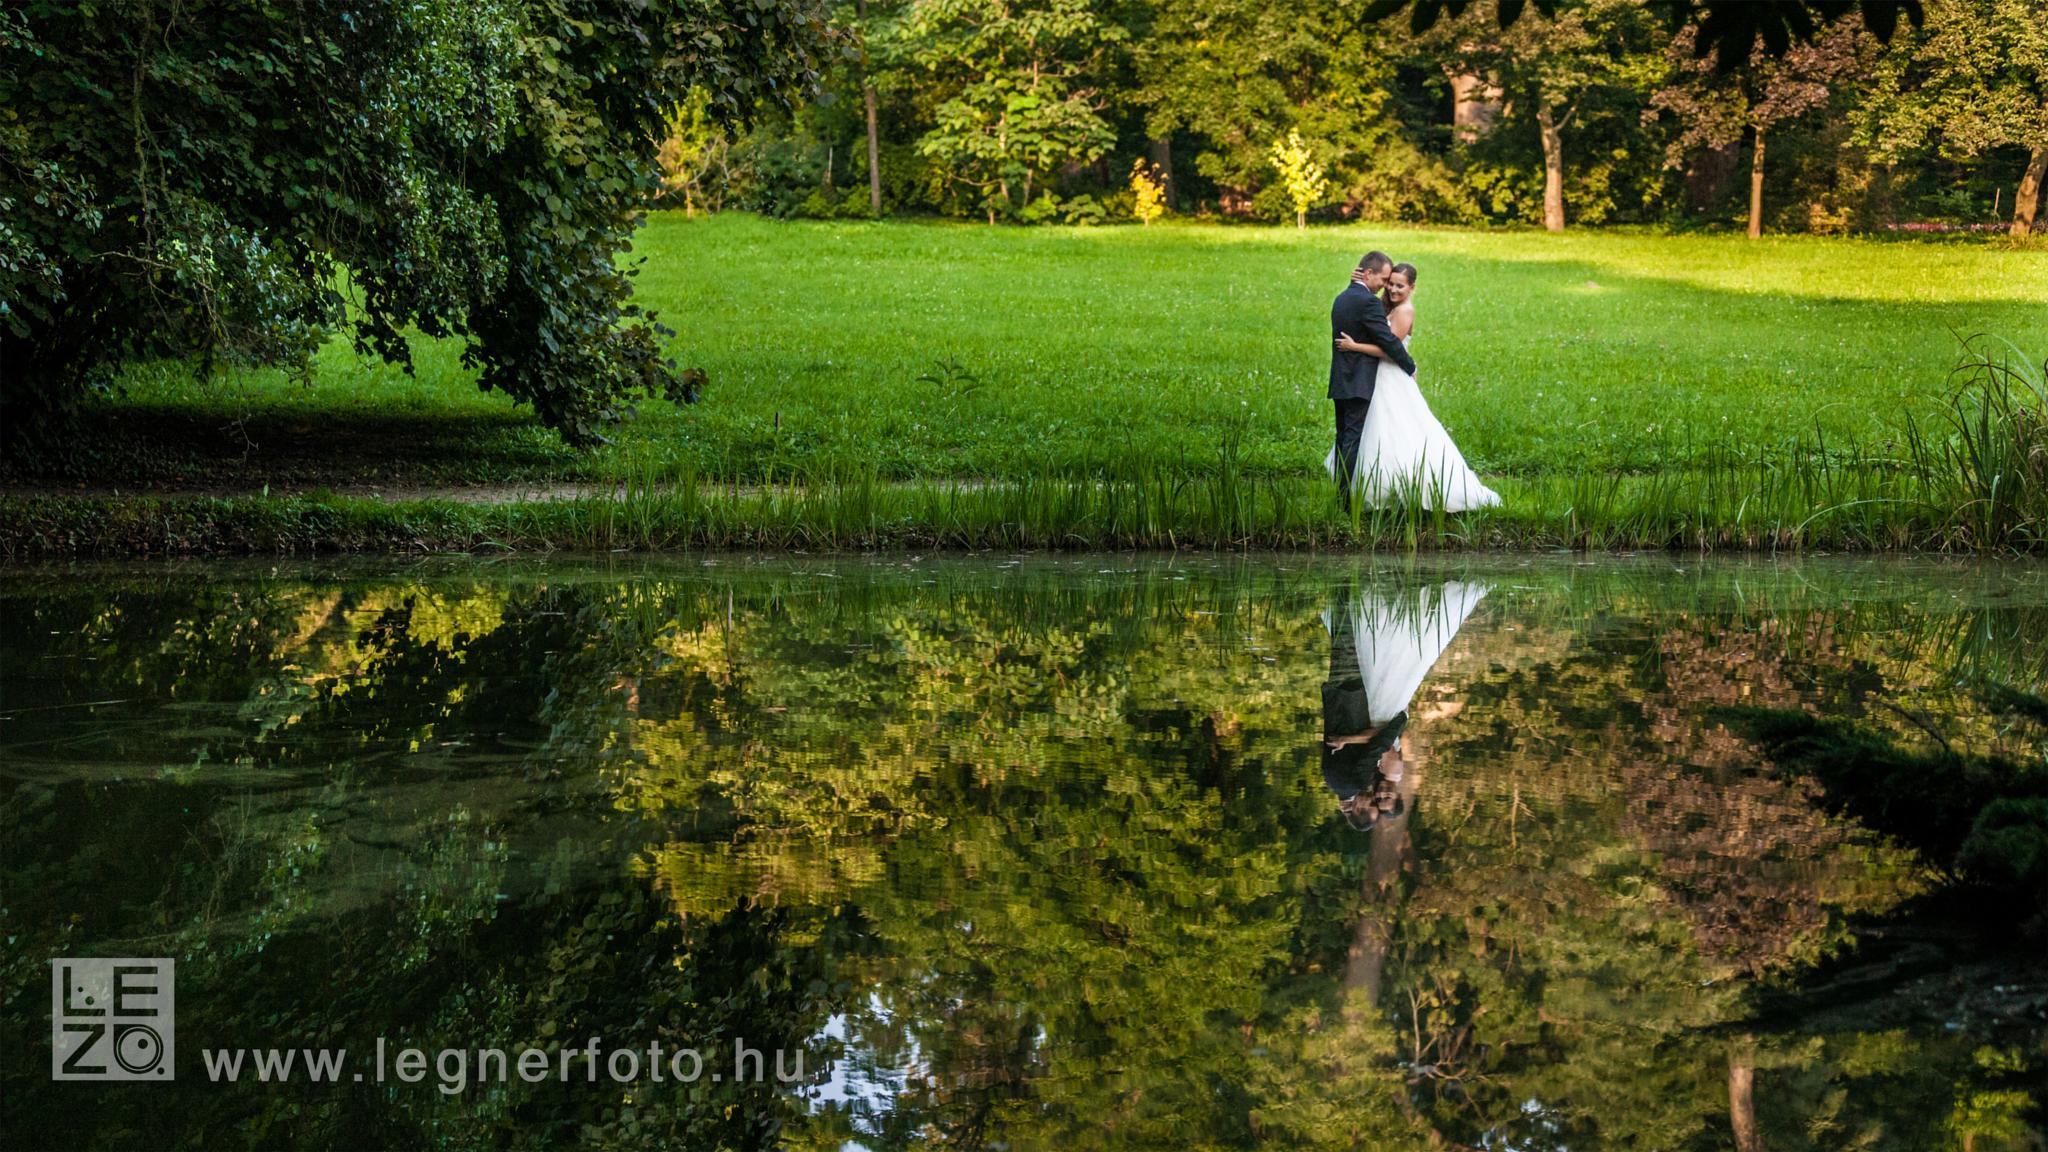 Reflection by zoltan.legner